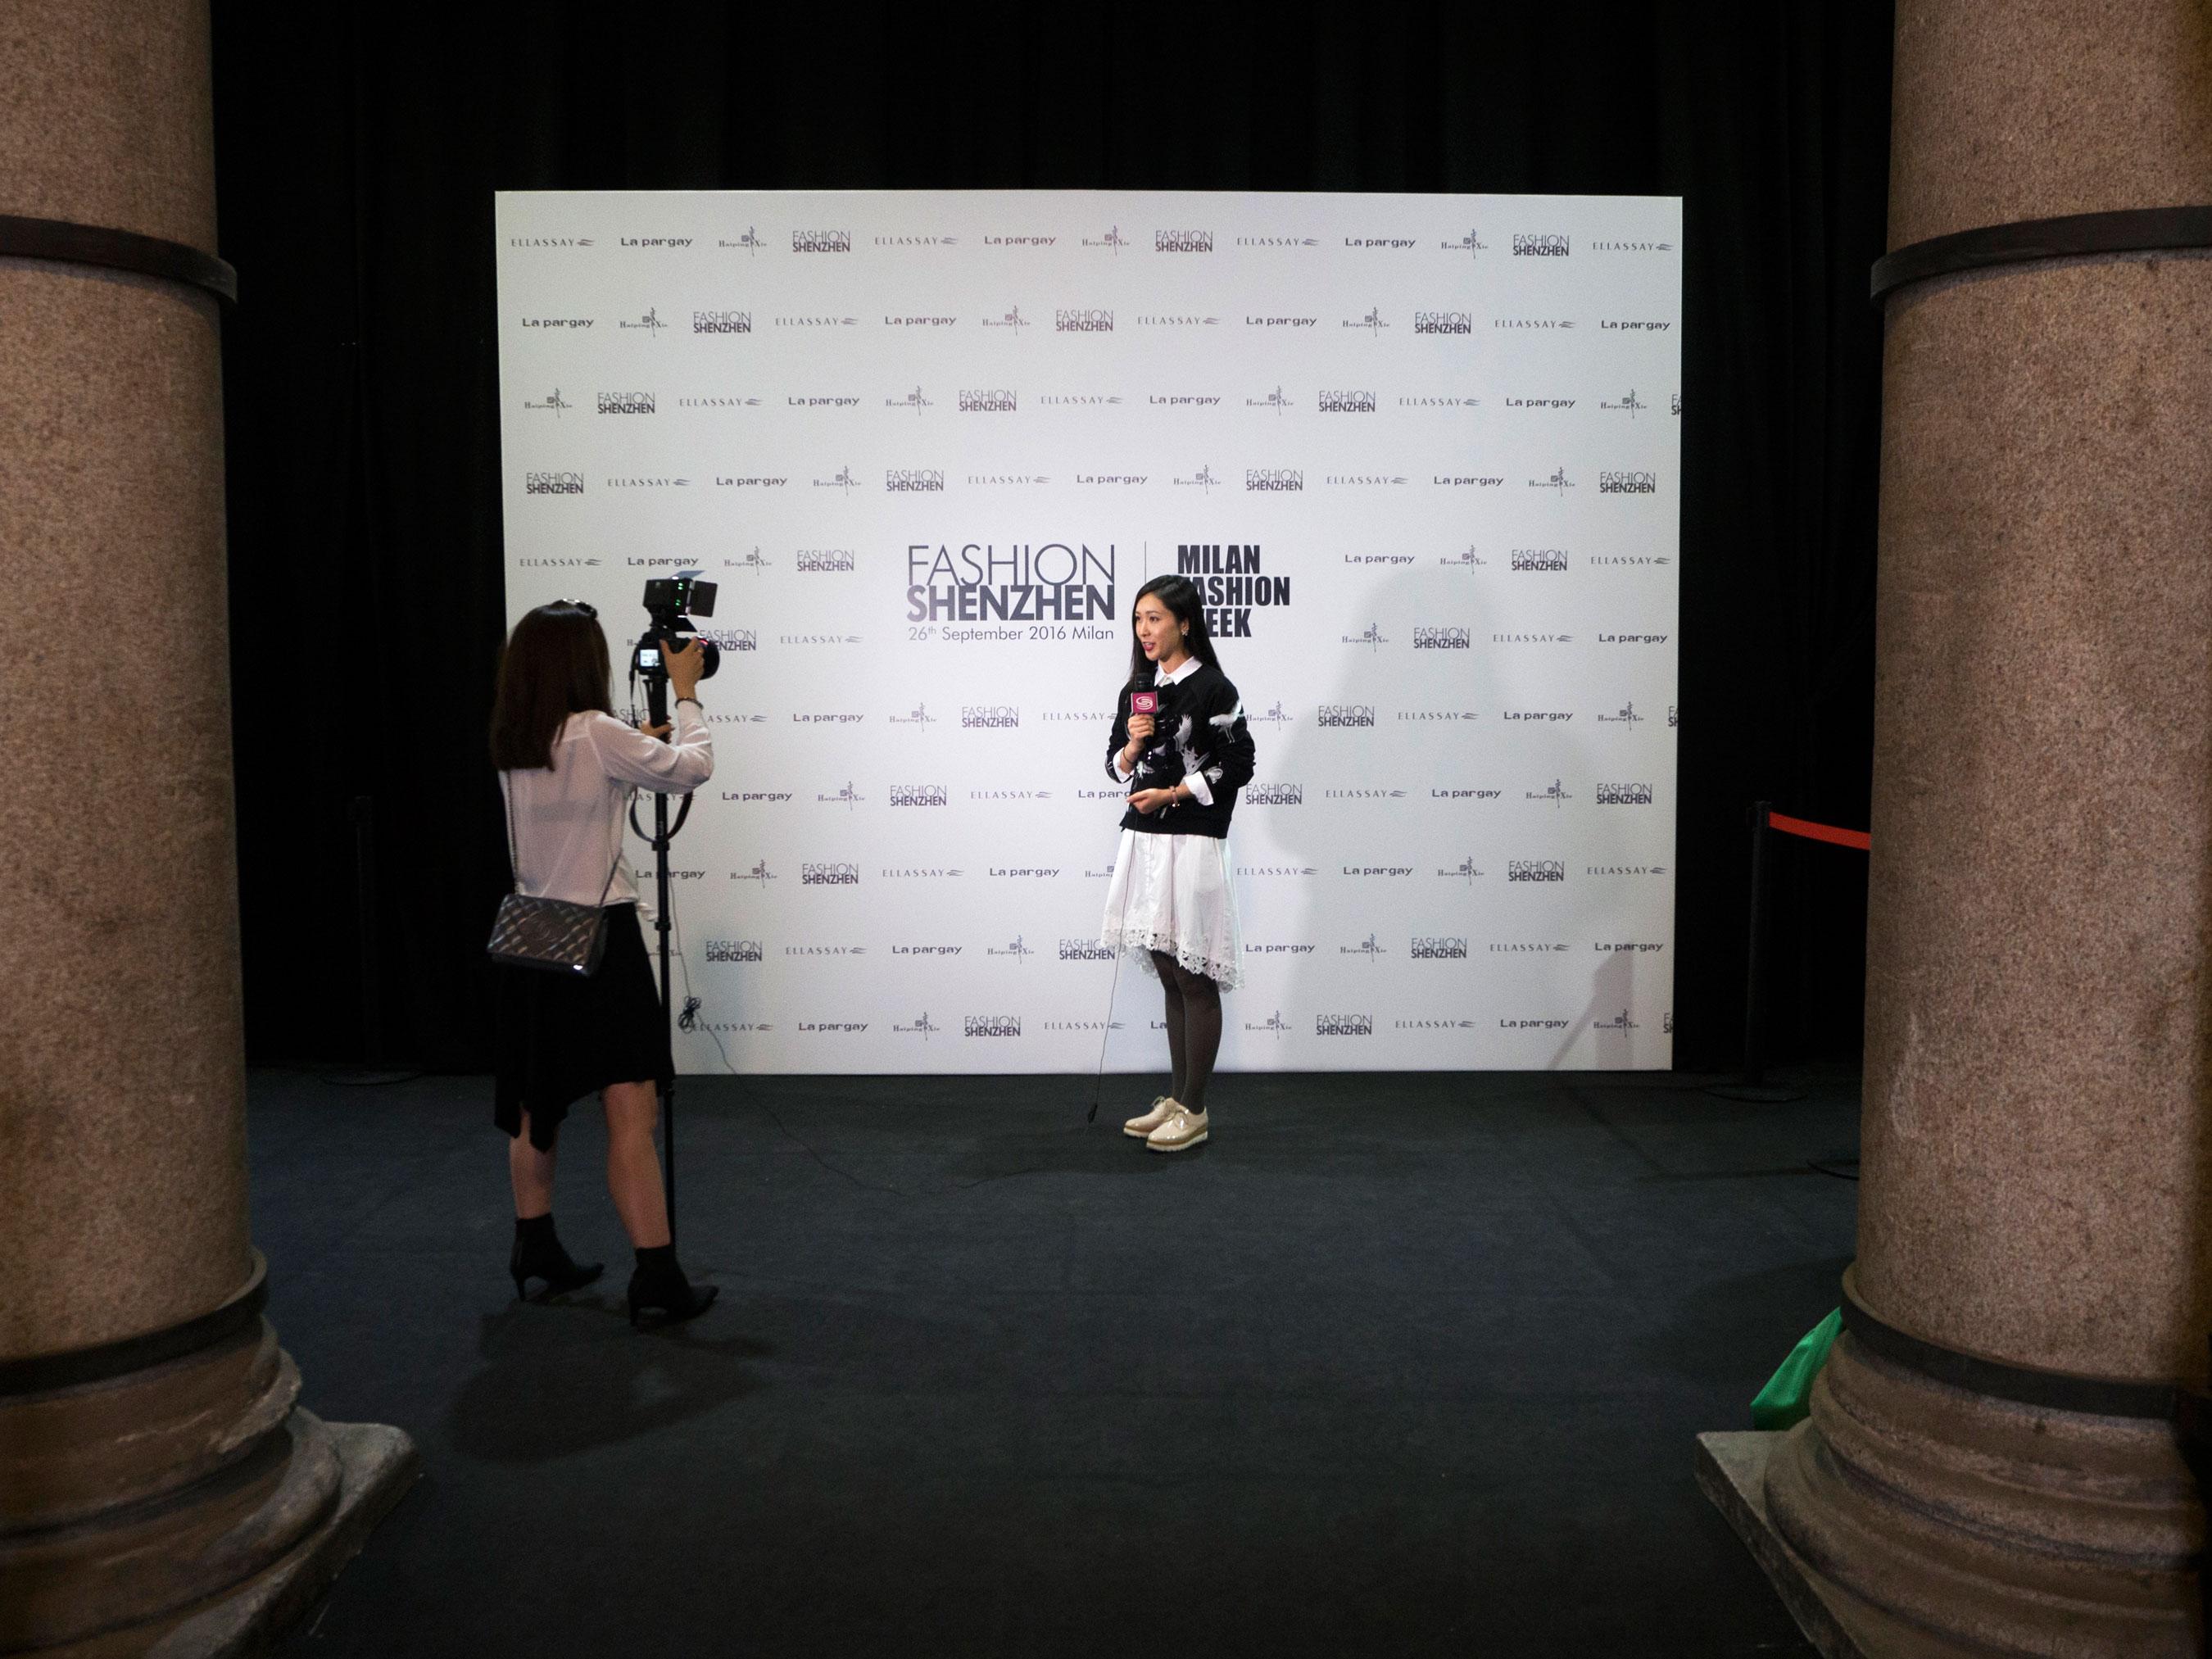 Fashion Shenzhen atm RS17 0017